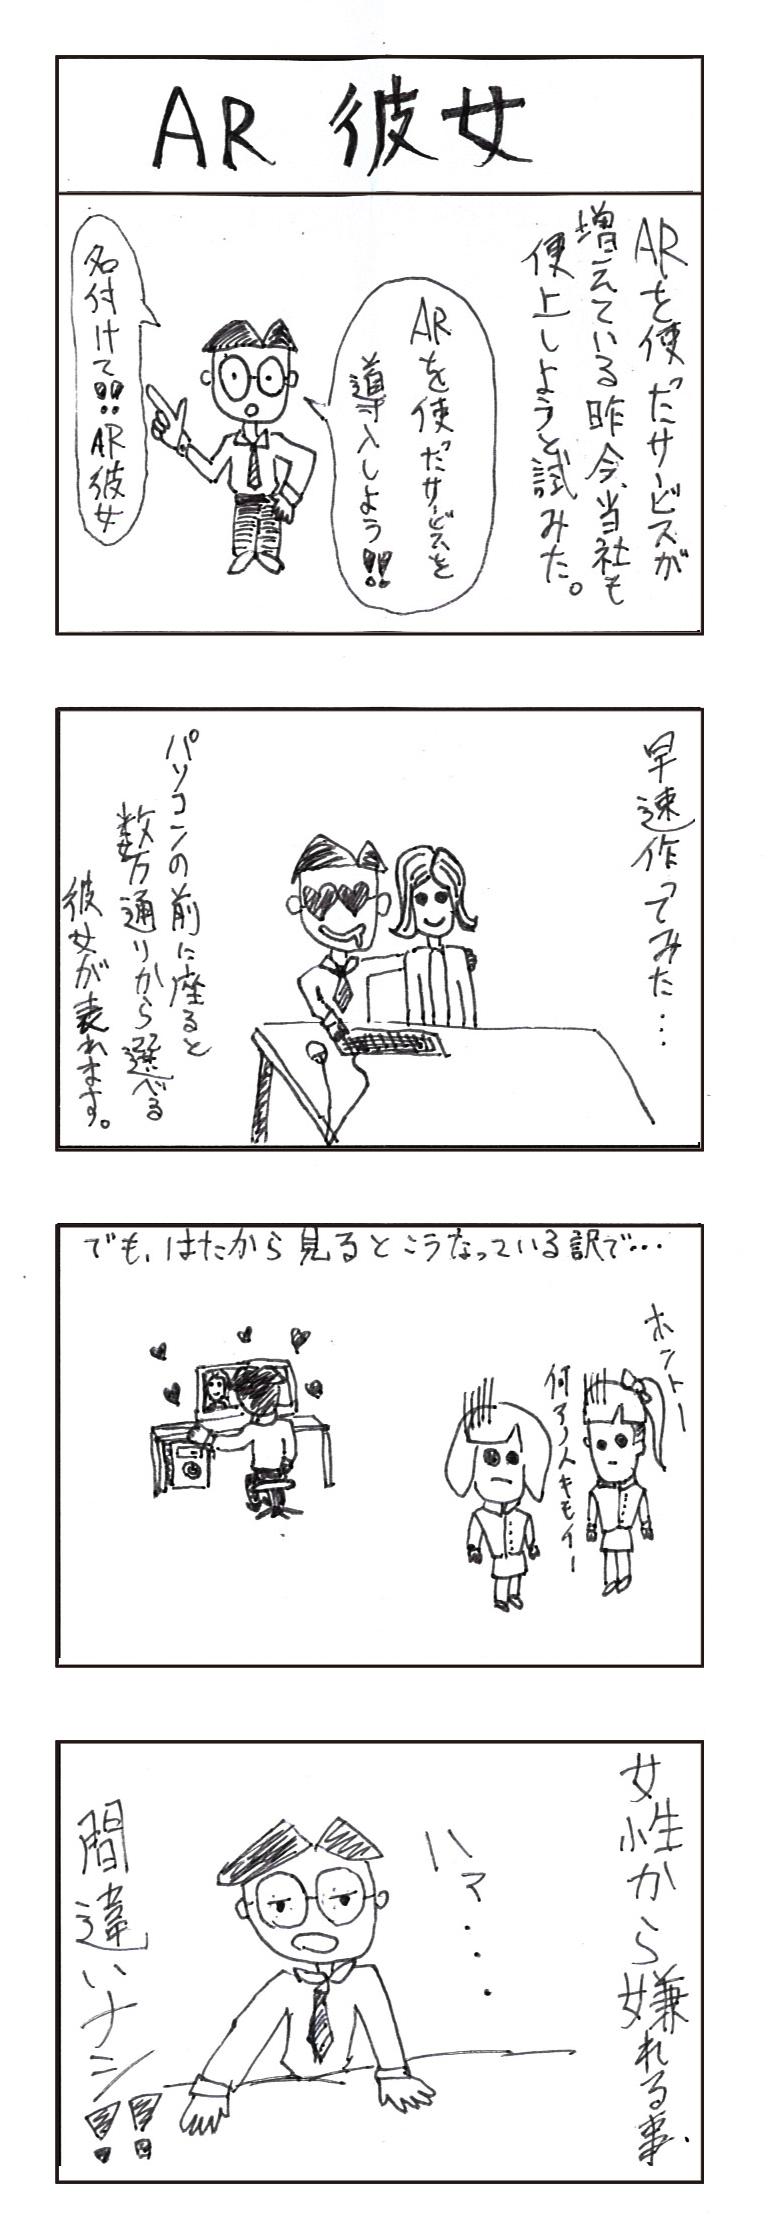 4koma-5